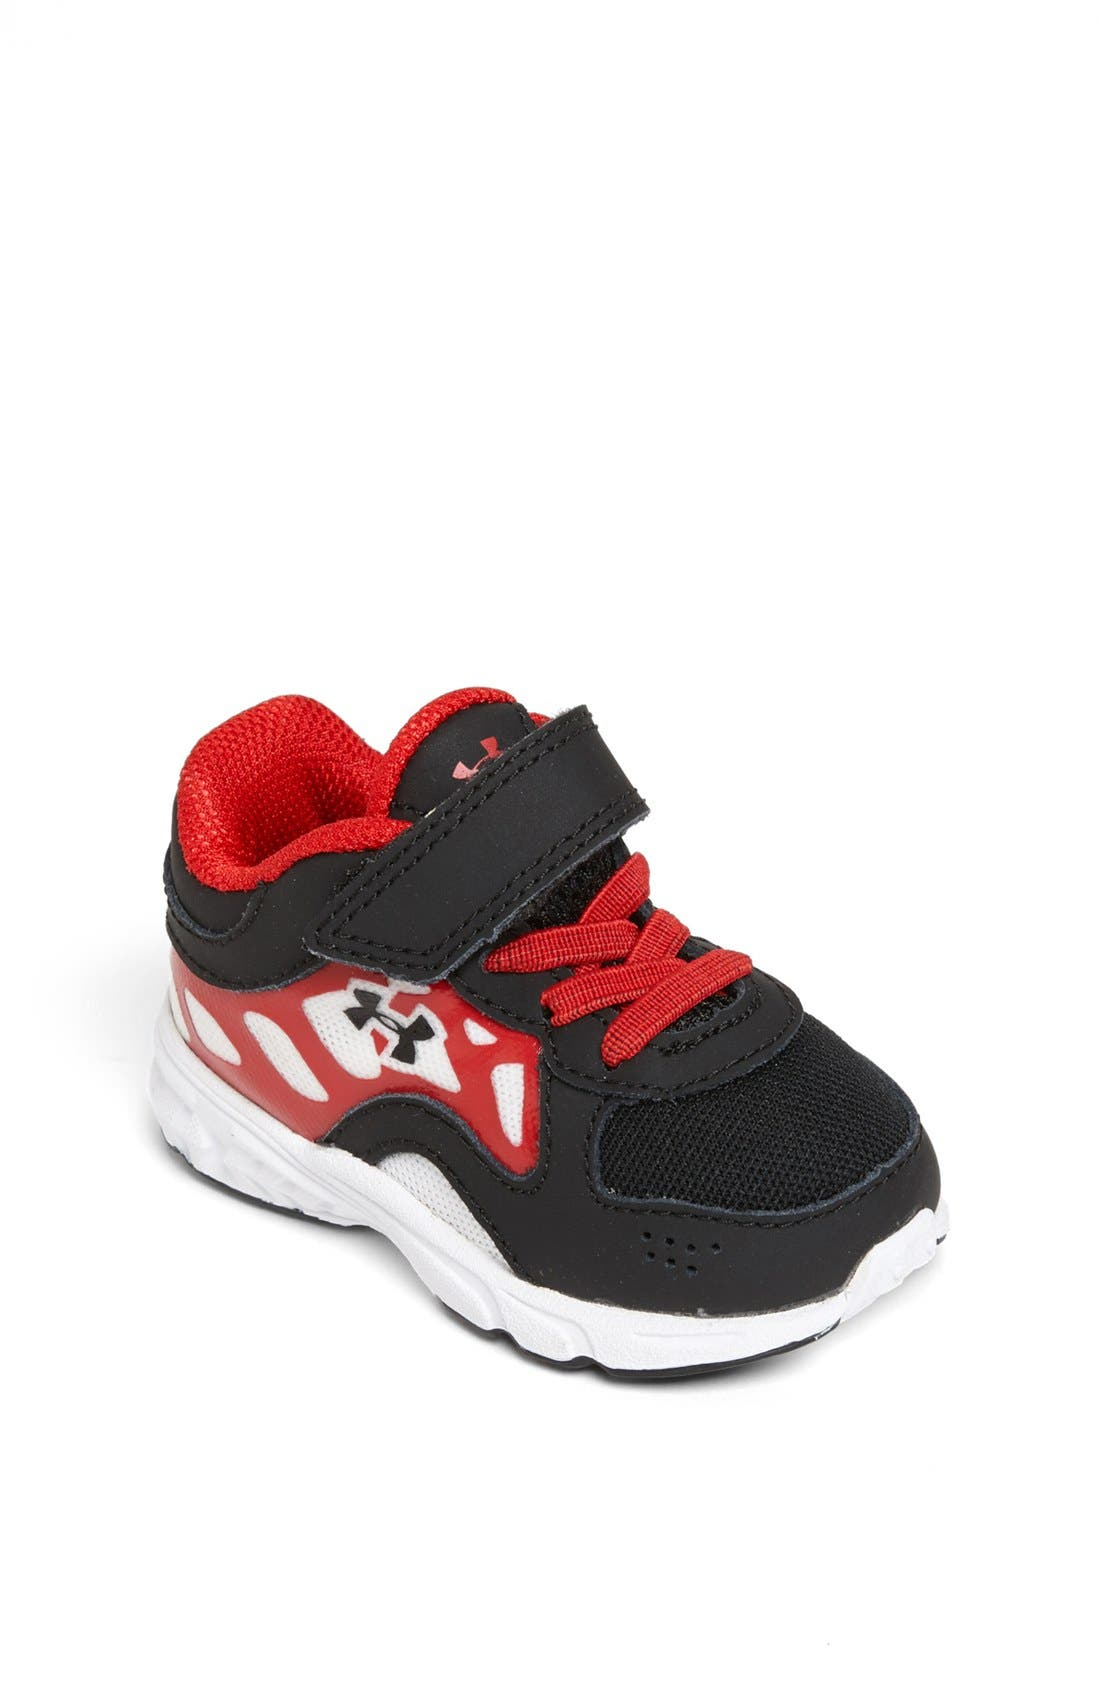 Main Image - Under Armour 'Ignite' Sneaker (Baby, Walker & Toddler)